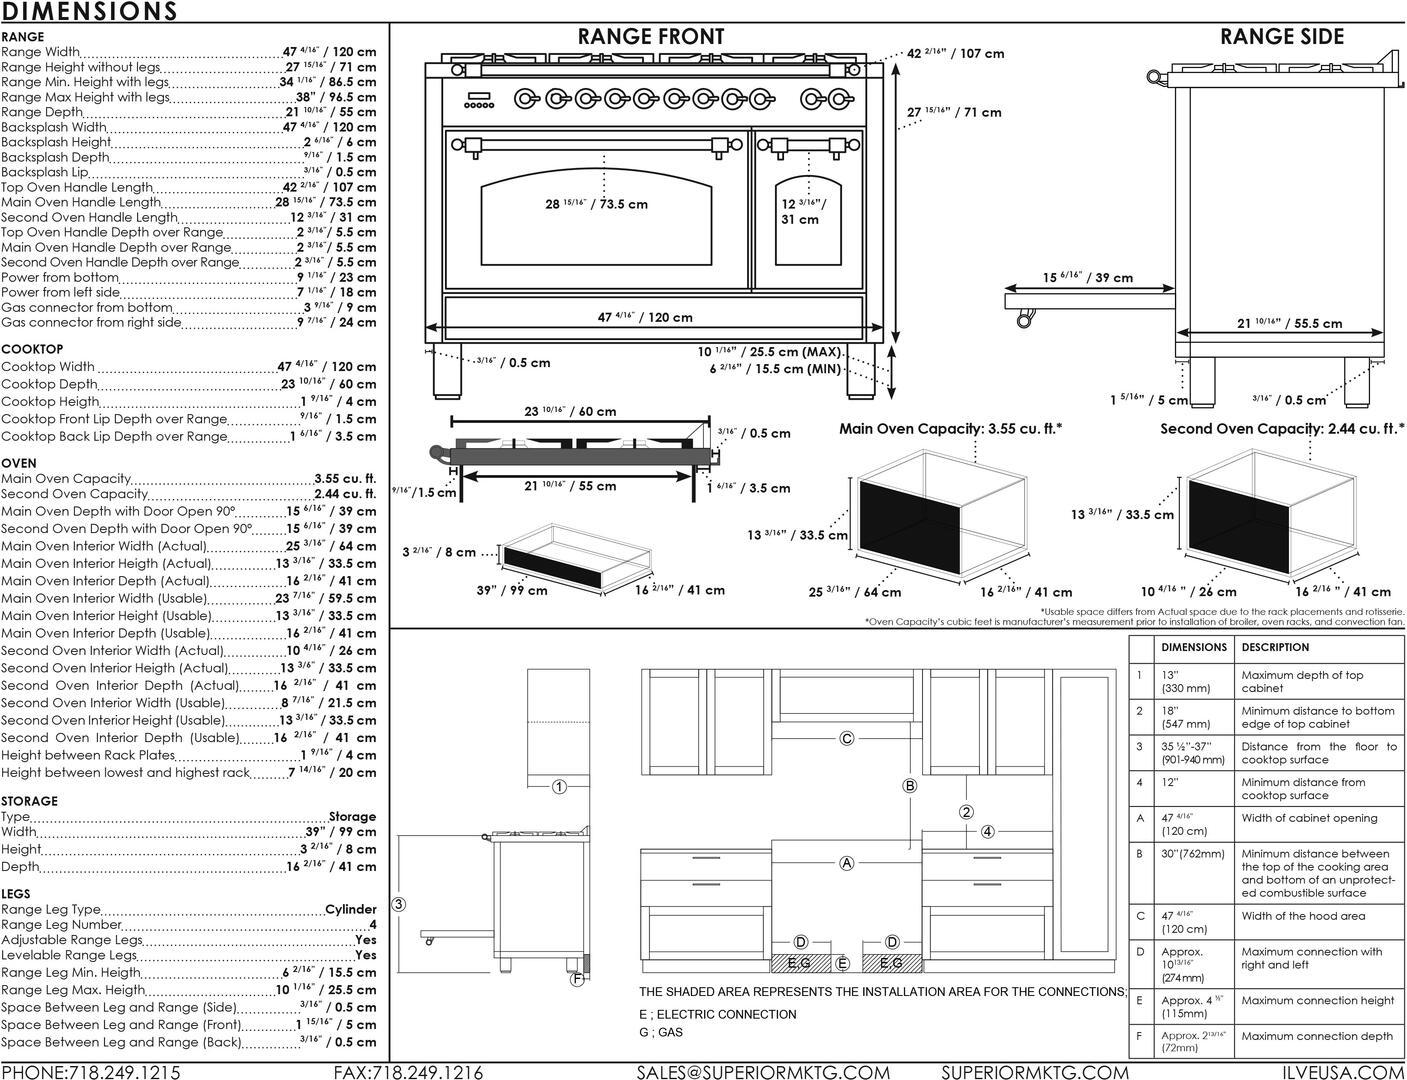 Ilve Nostalgie UPN120FDMPAY Freestanding Dual Fuel Range Bisque, UPN120FDM Dimensions Guide